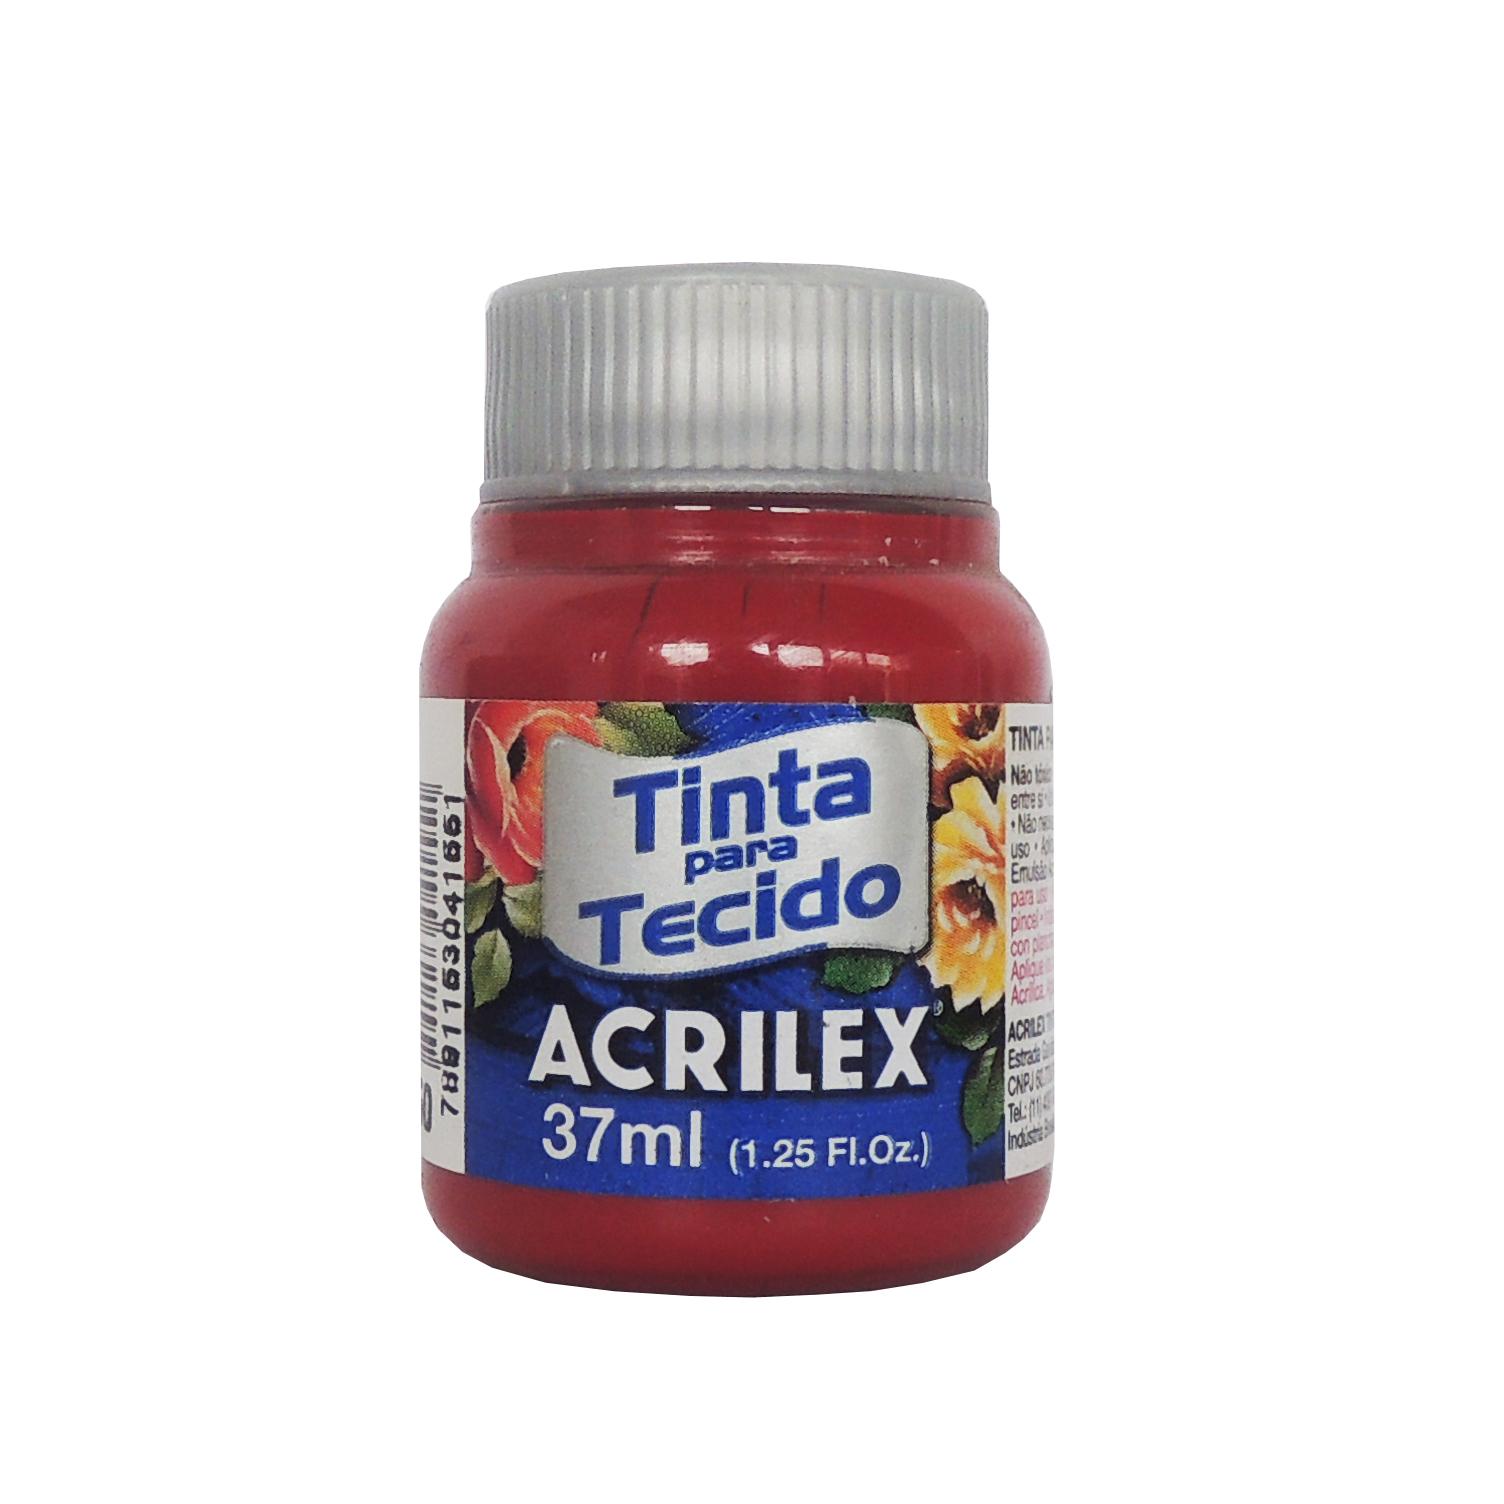 Tinta-para-Tecido-Acrilex-37ml-550-Purpura